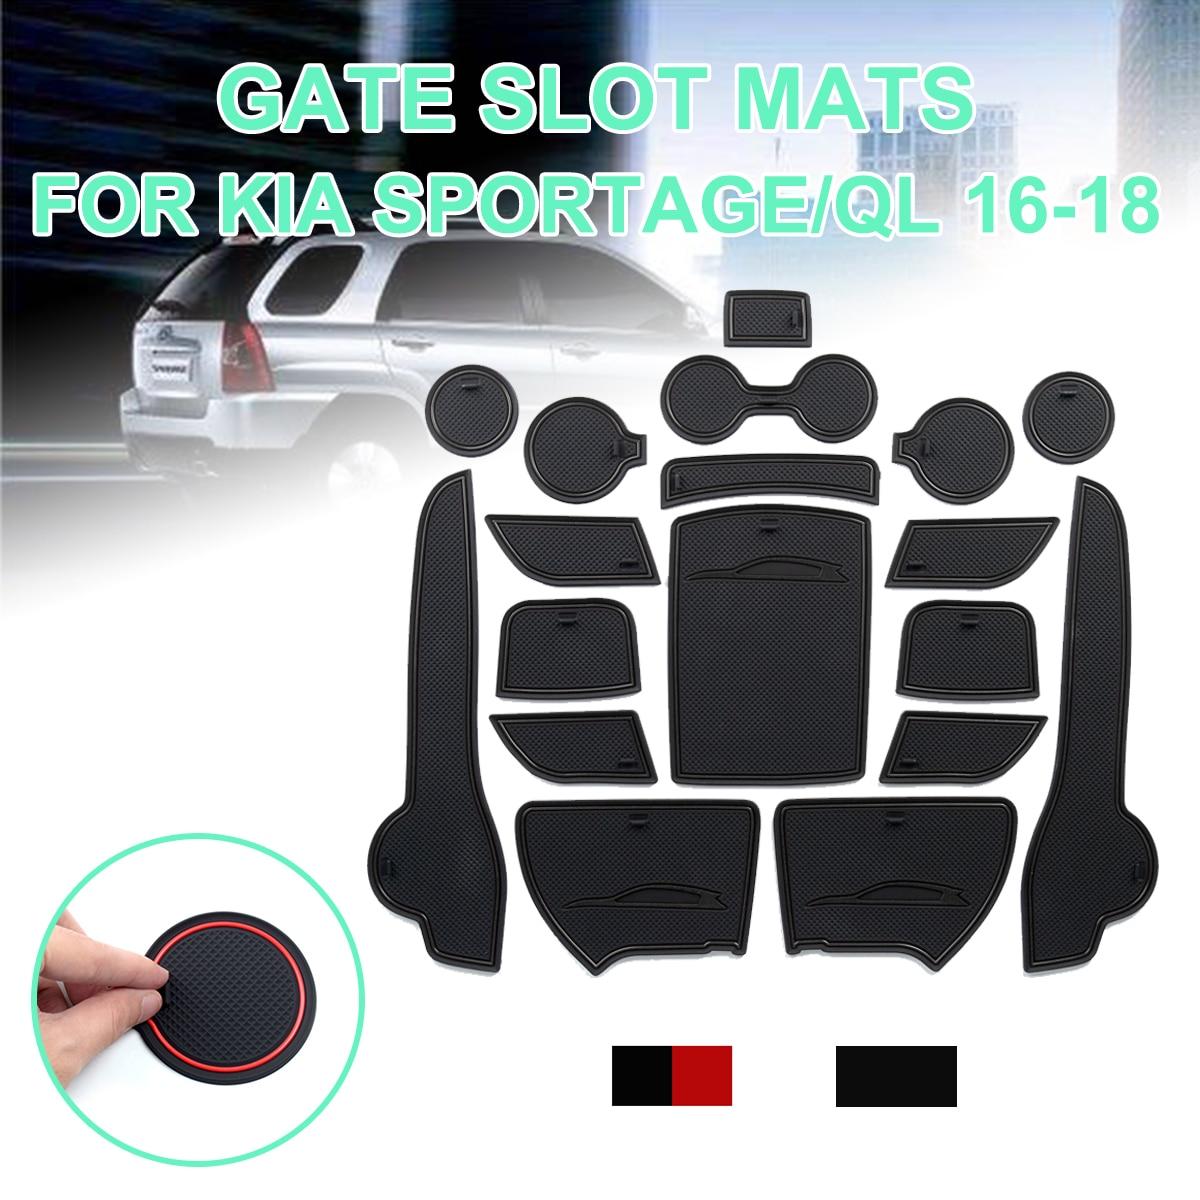 Para KIA Sportage 2016 2017 2018 2019 QL 4th Gen MK4 KX5 antideslizante de goma ranura para puerta tapete tapetes accesorios pegatinas para coche